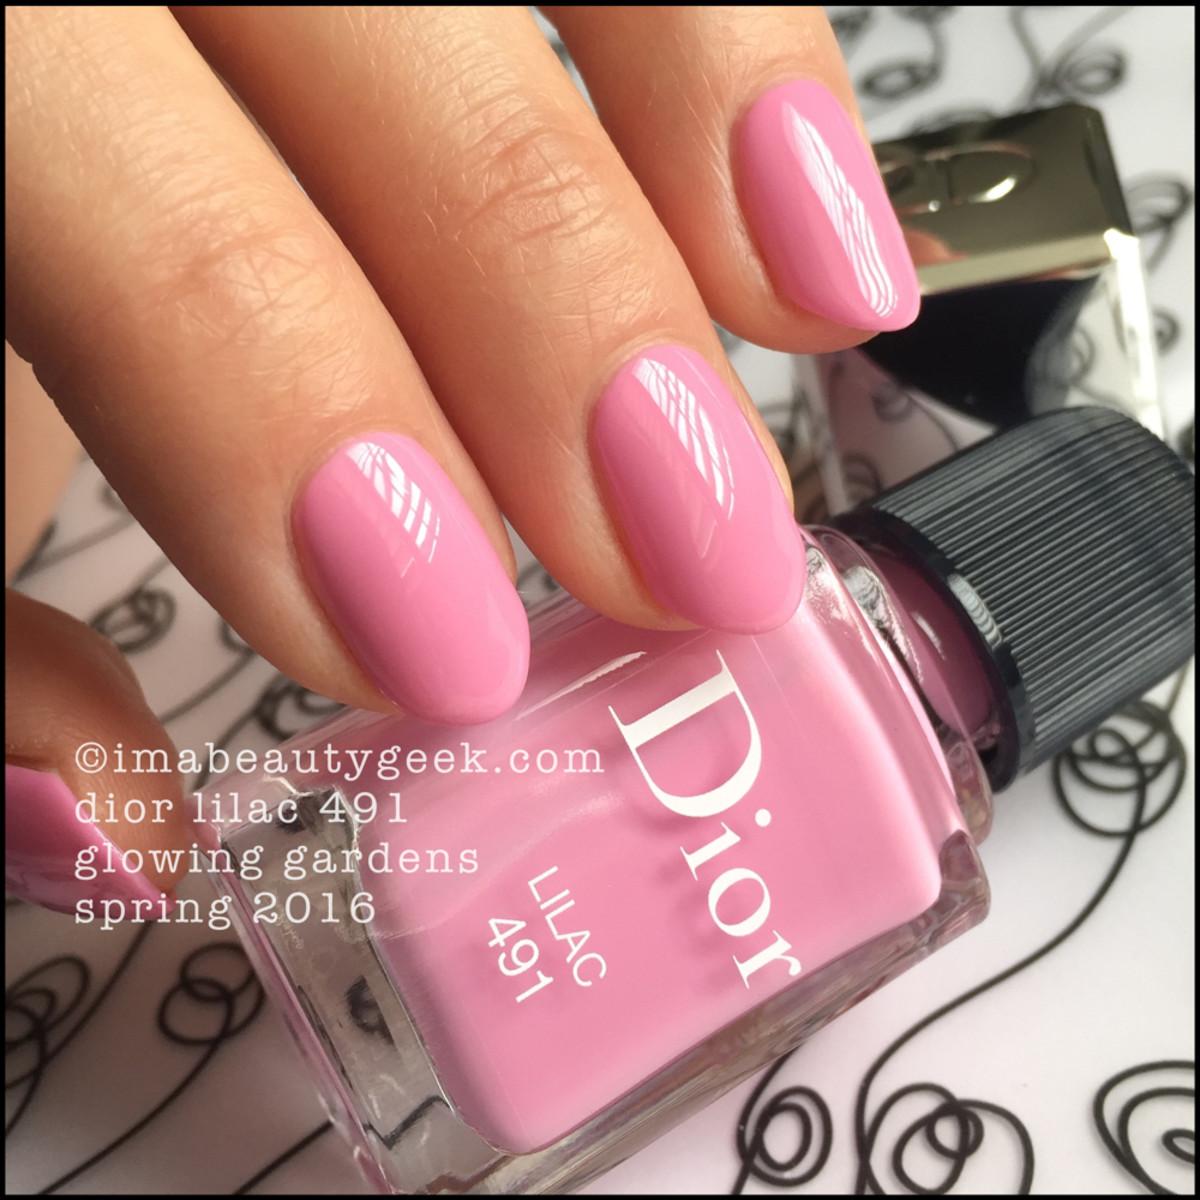 Dior Lilac 491 Vernis_Dior Glowing Gardens Spring 2016